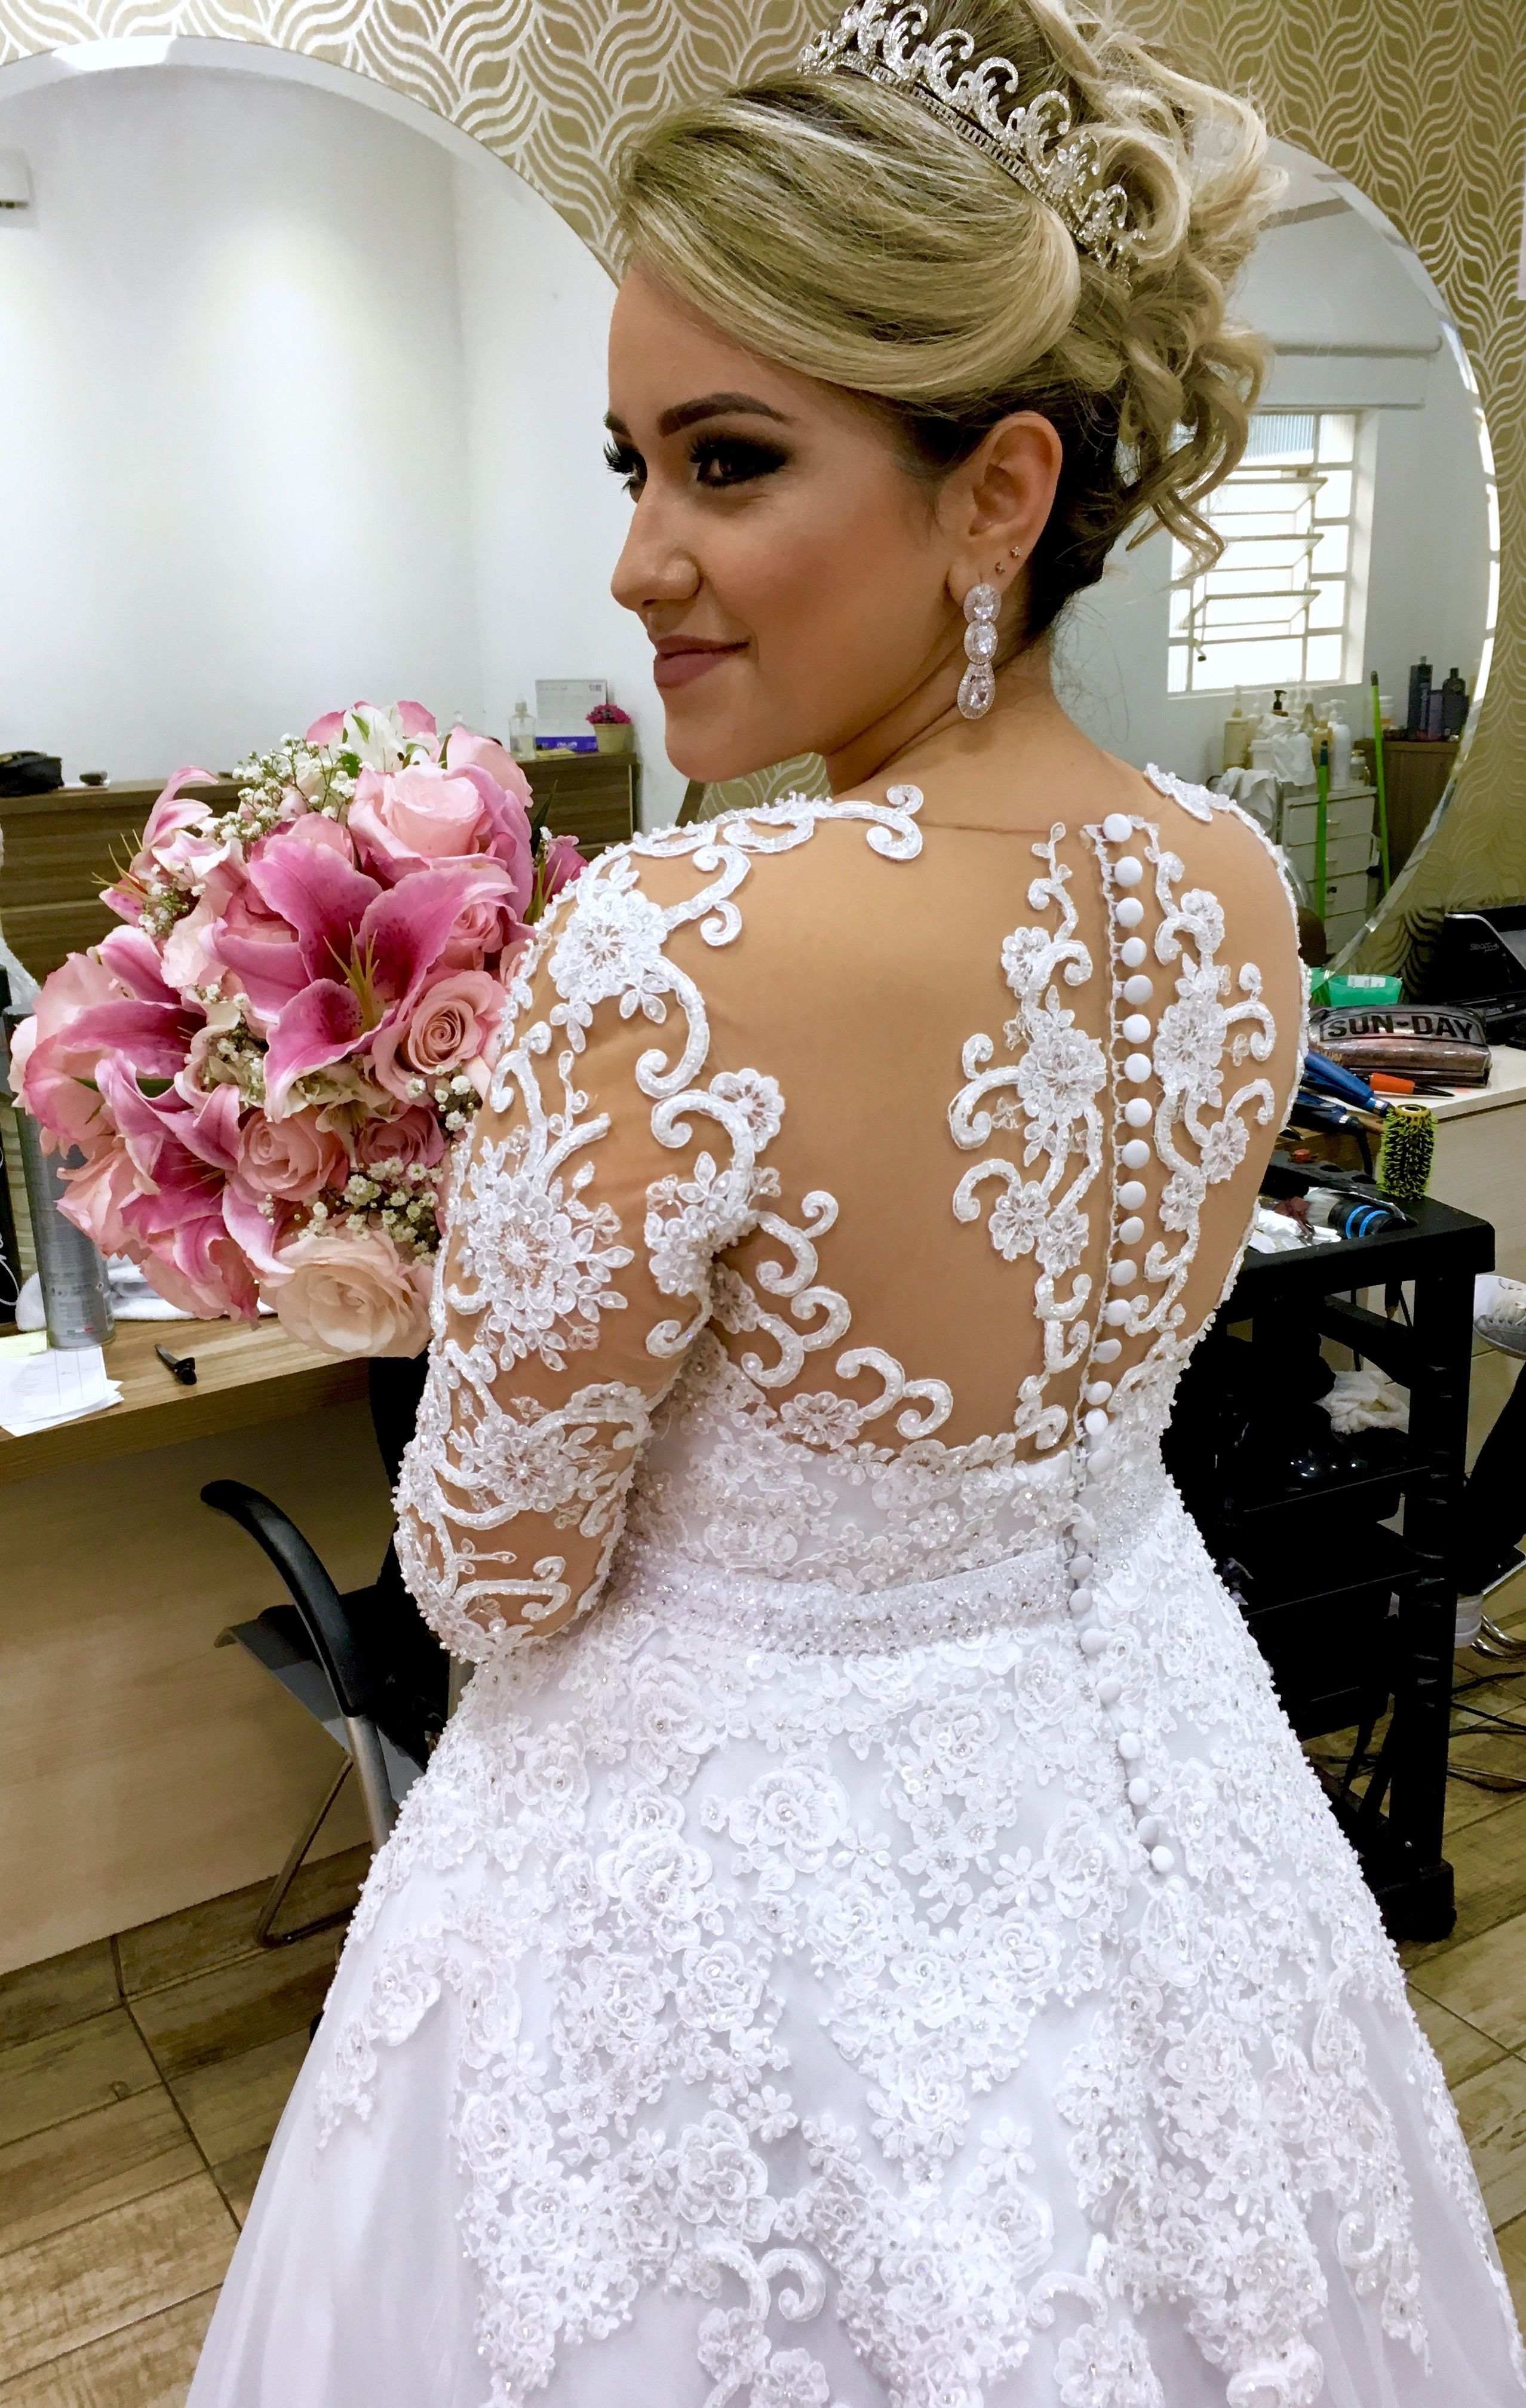 Bride dress back detail lace applications buttons transparency